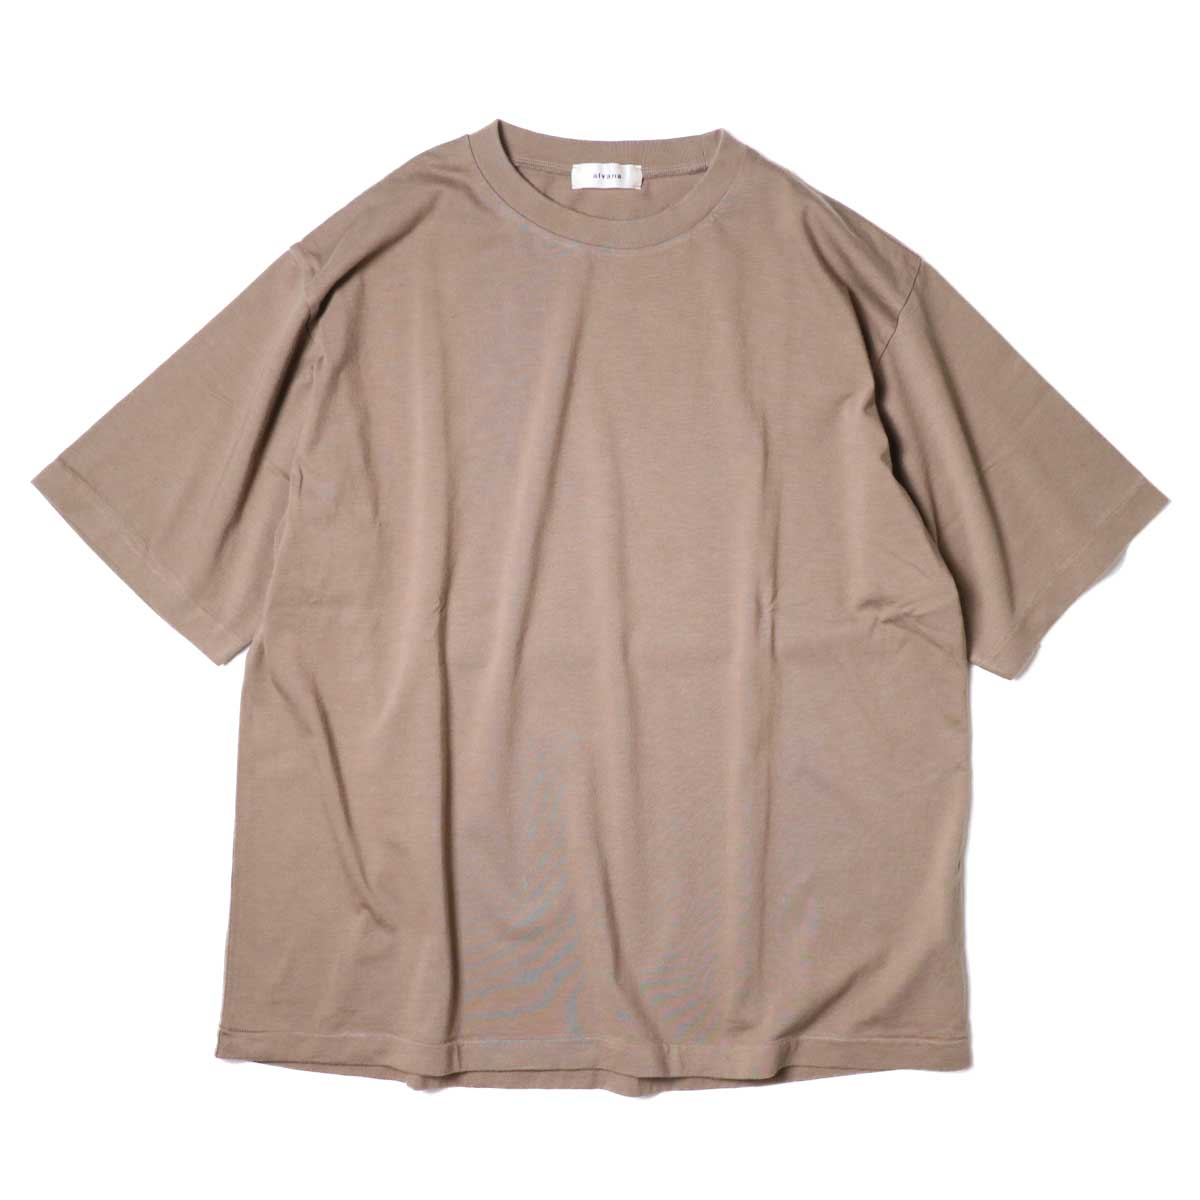 alvana / Dairy Oversize Tee Shirts (Sunset Beige) 正面